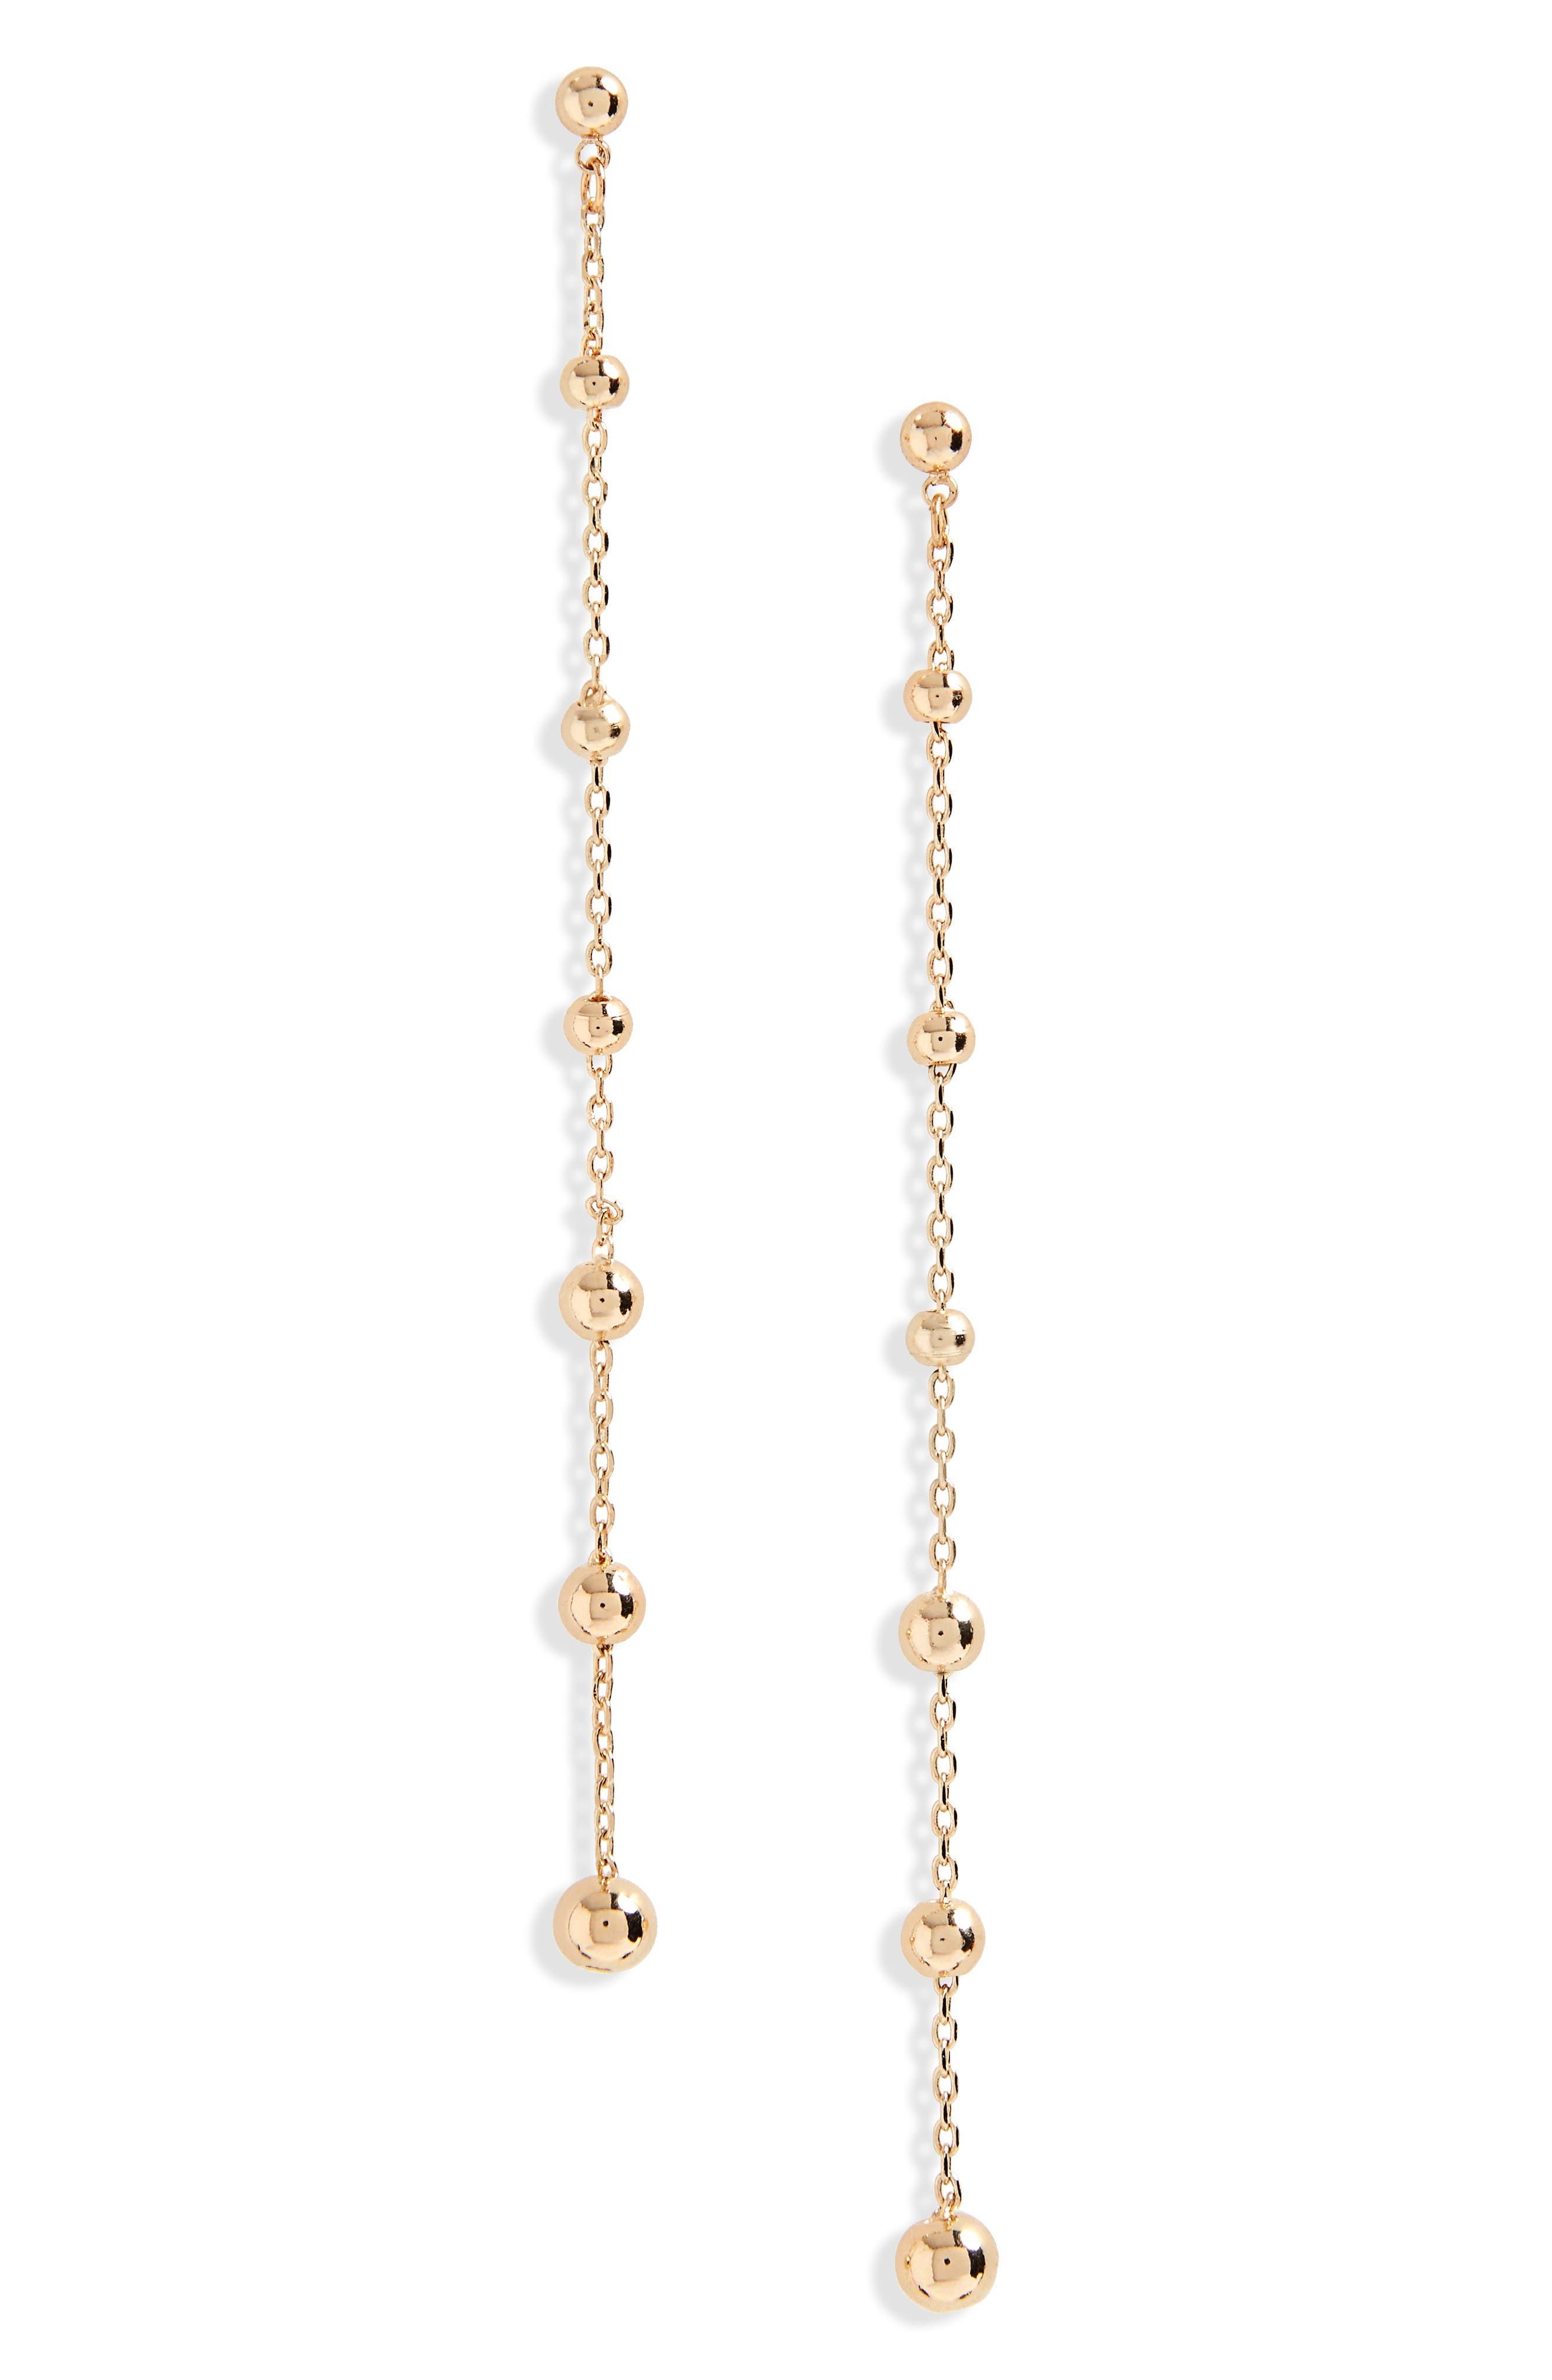 Alternate Image 1 Selected - BP. Chain & Ball Drop Earrings